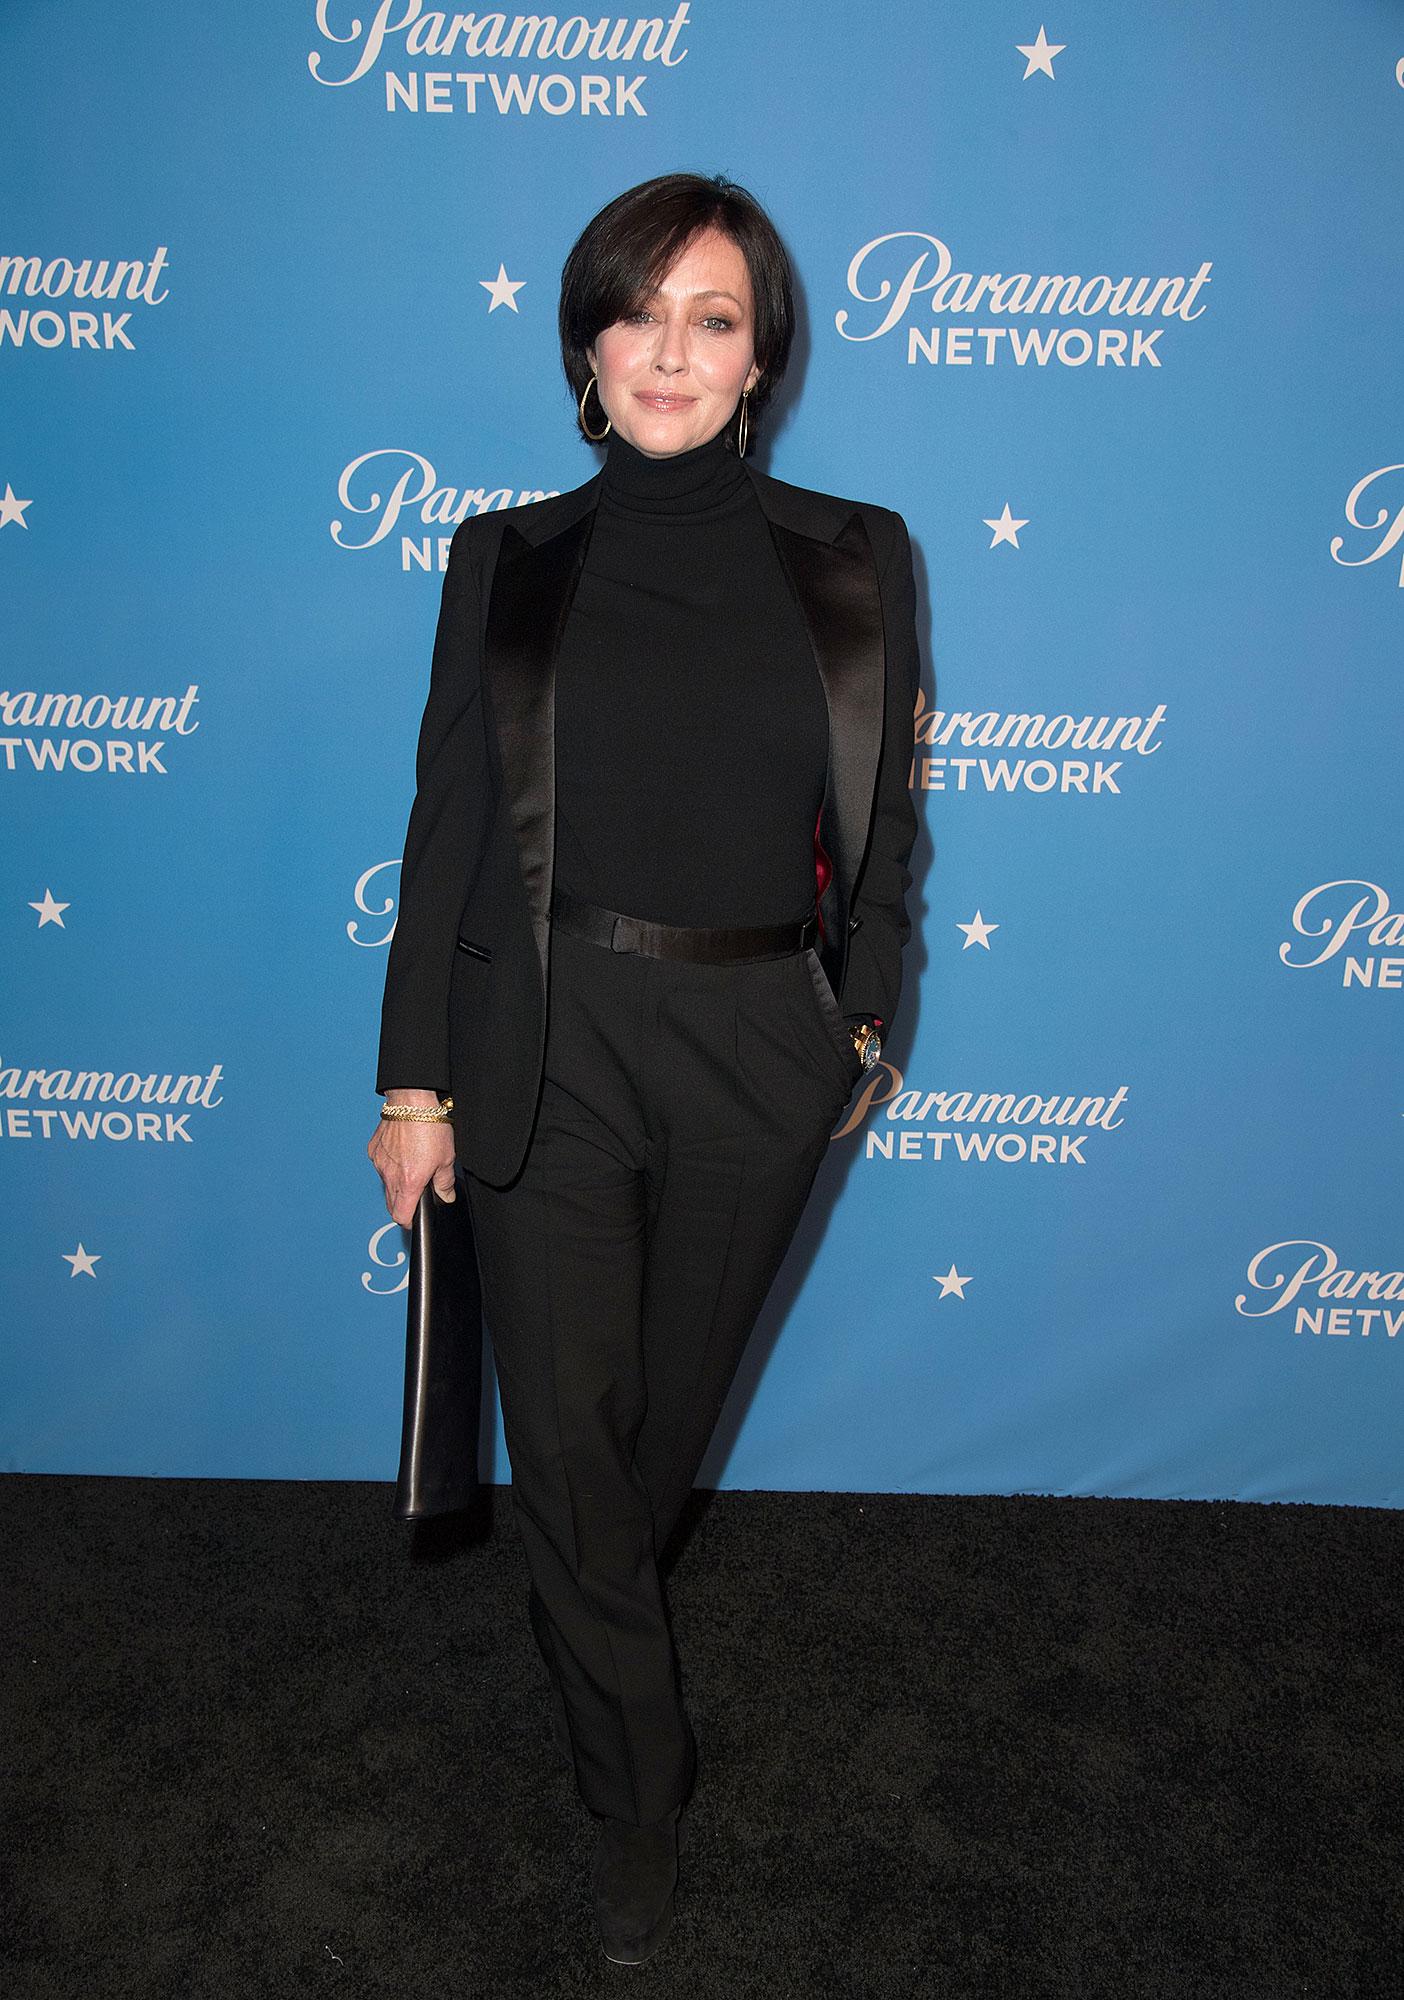 Shannen Doherty Joins 90210 Reboot